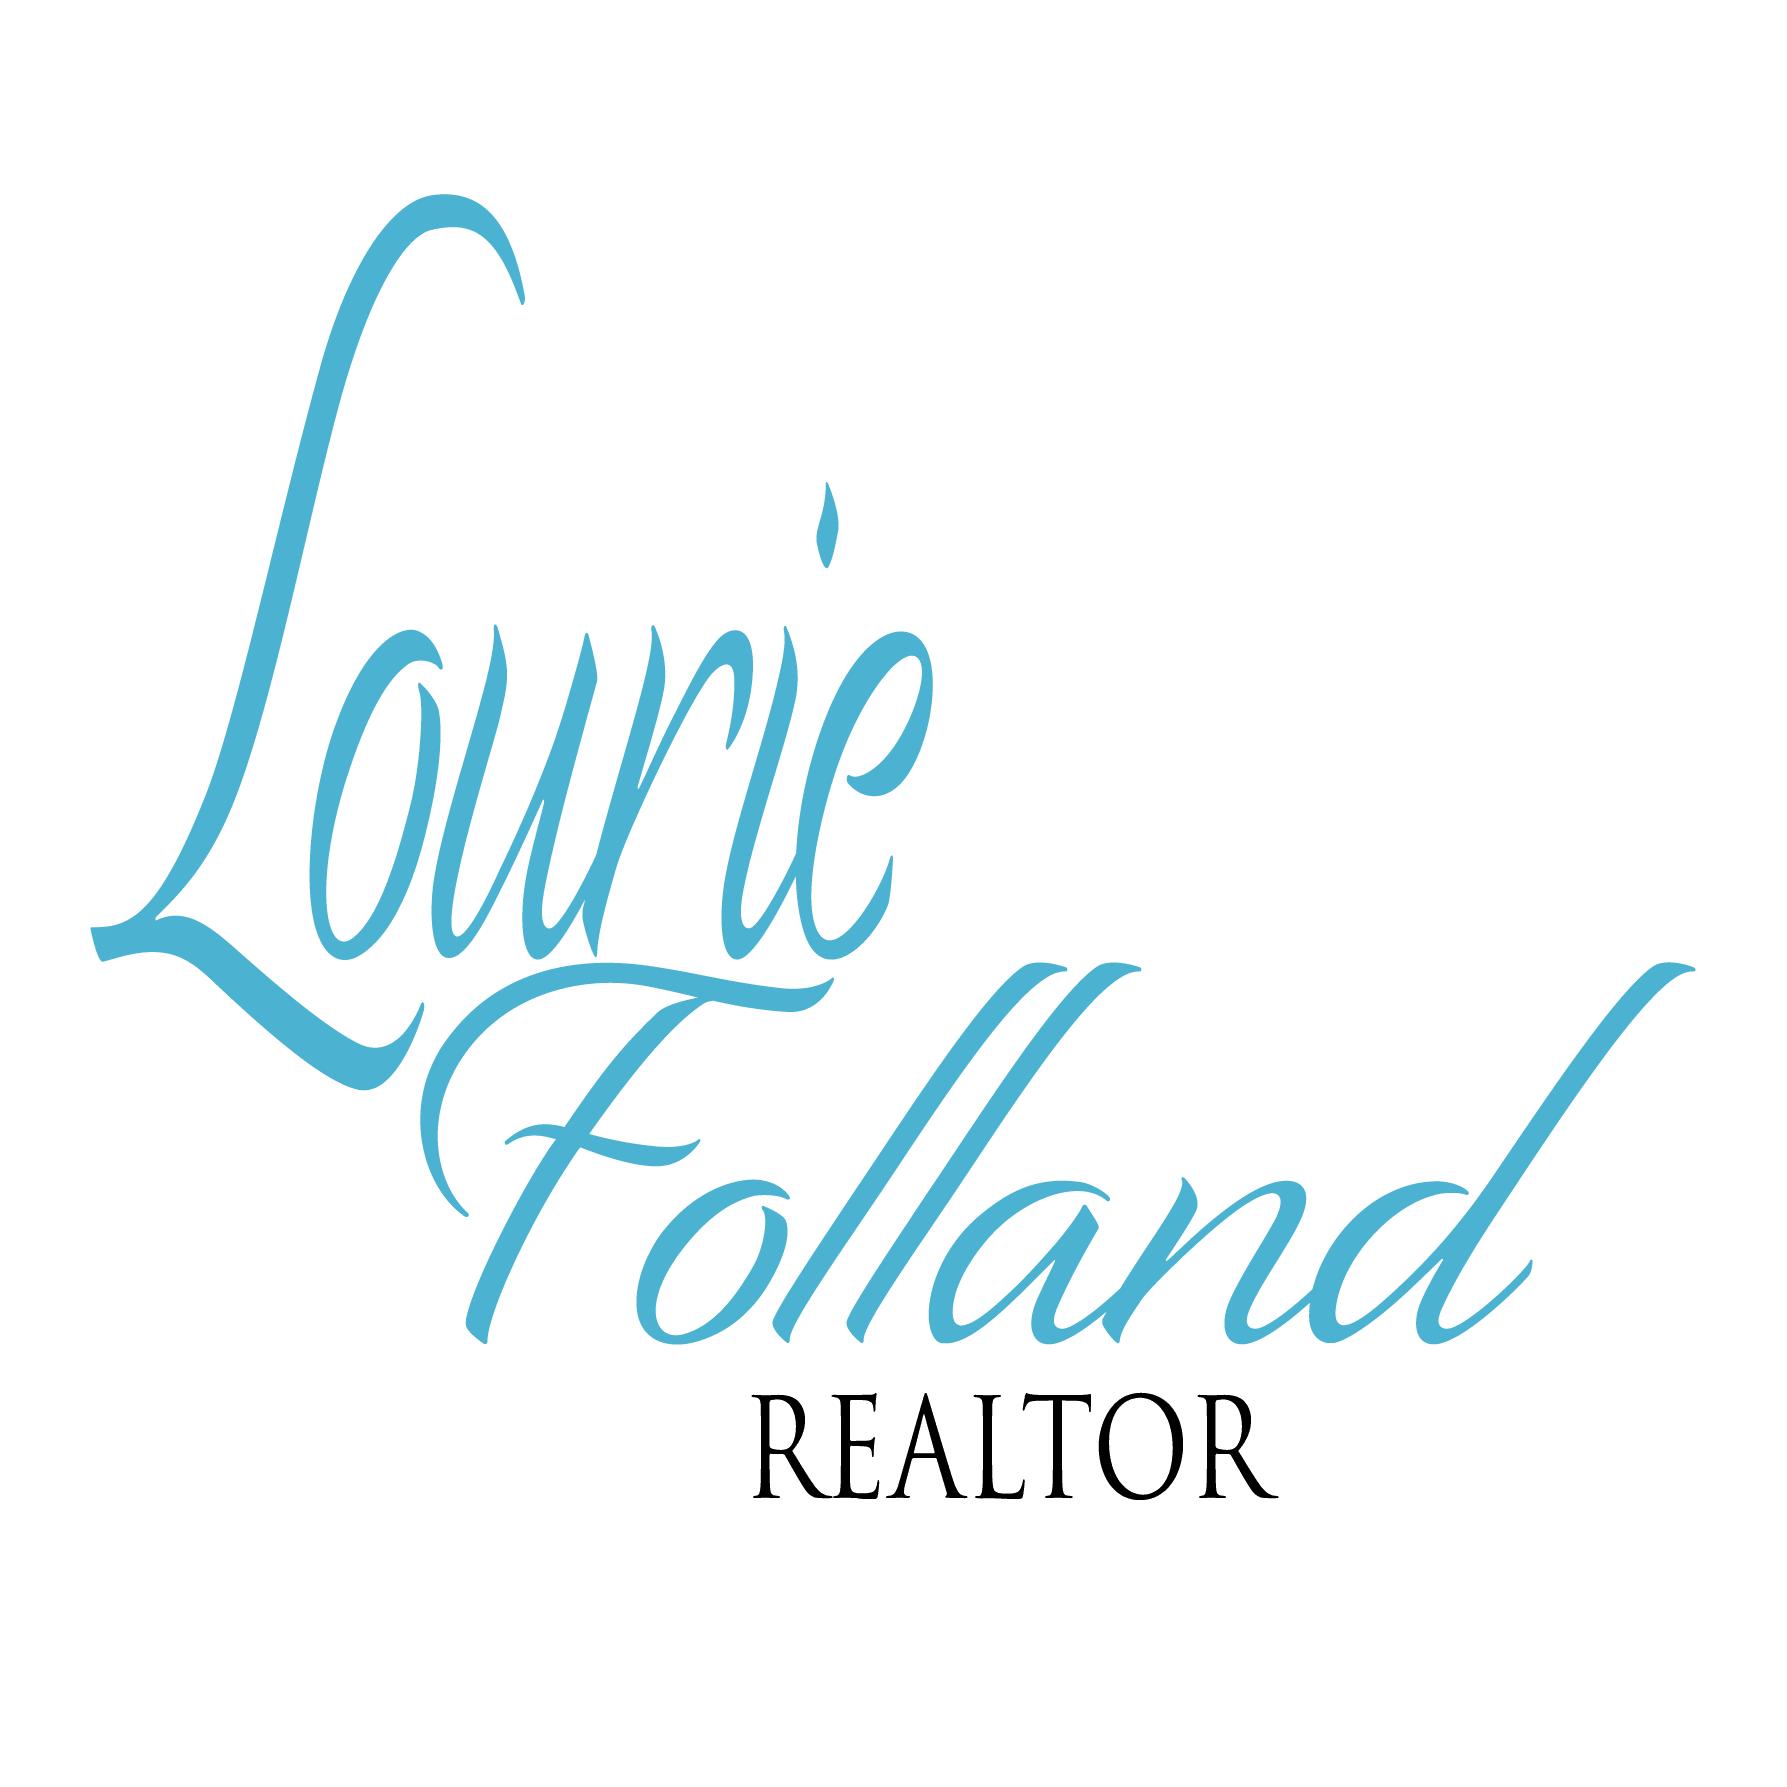 Peak Performance Realty- Lourie Folland